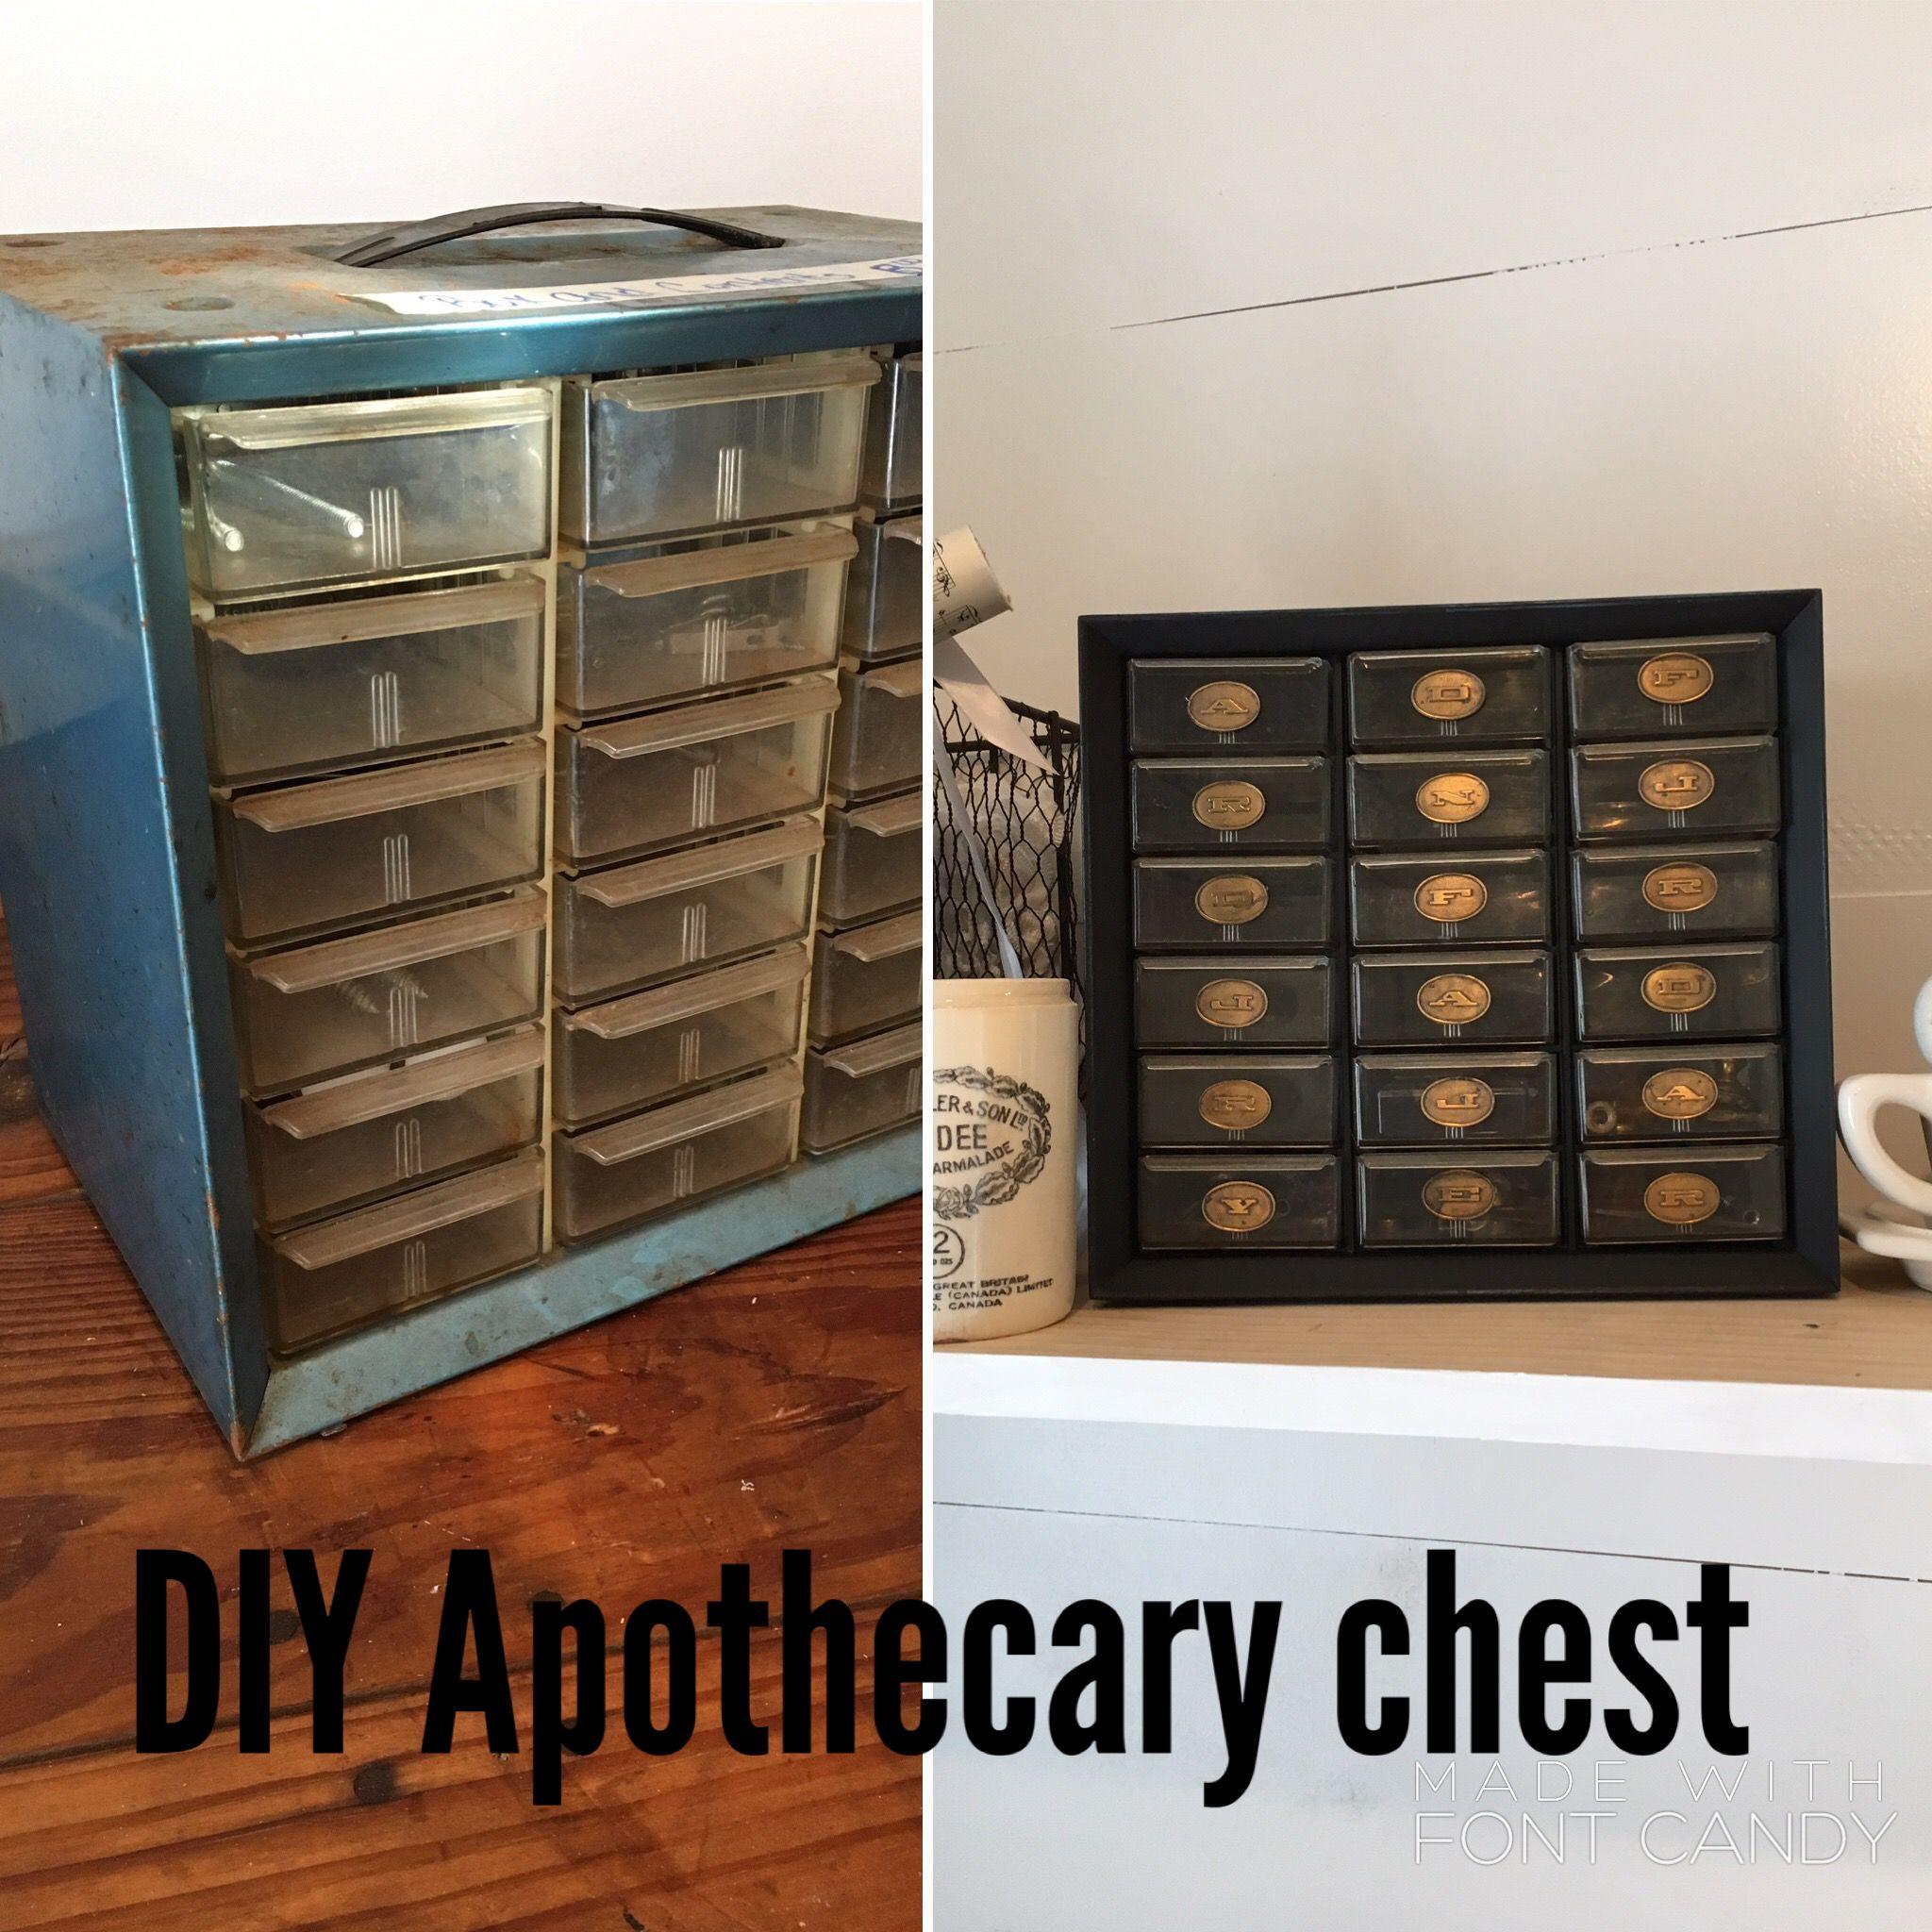 Diy Apothecary Chest Diy Home Furniture Diy Vintage Diy